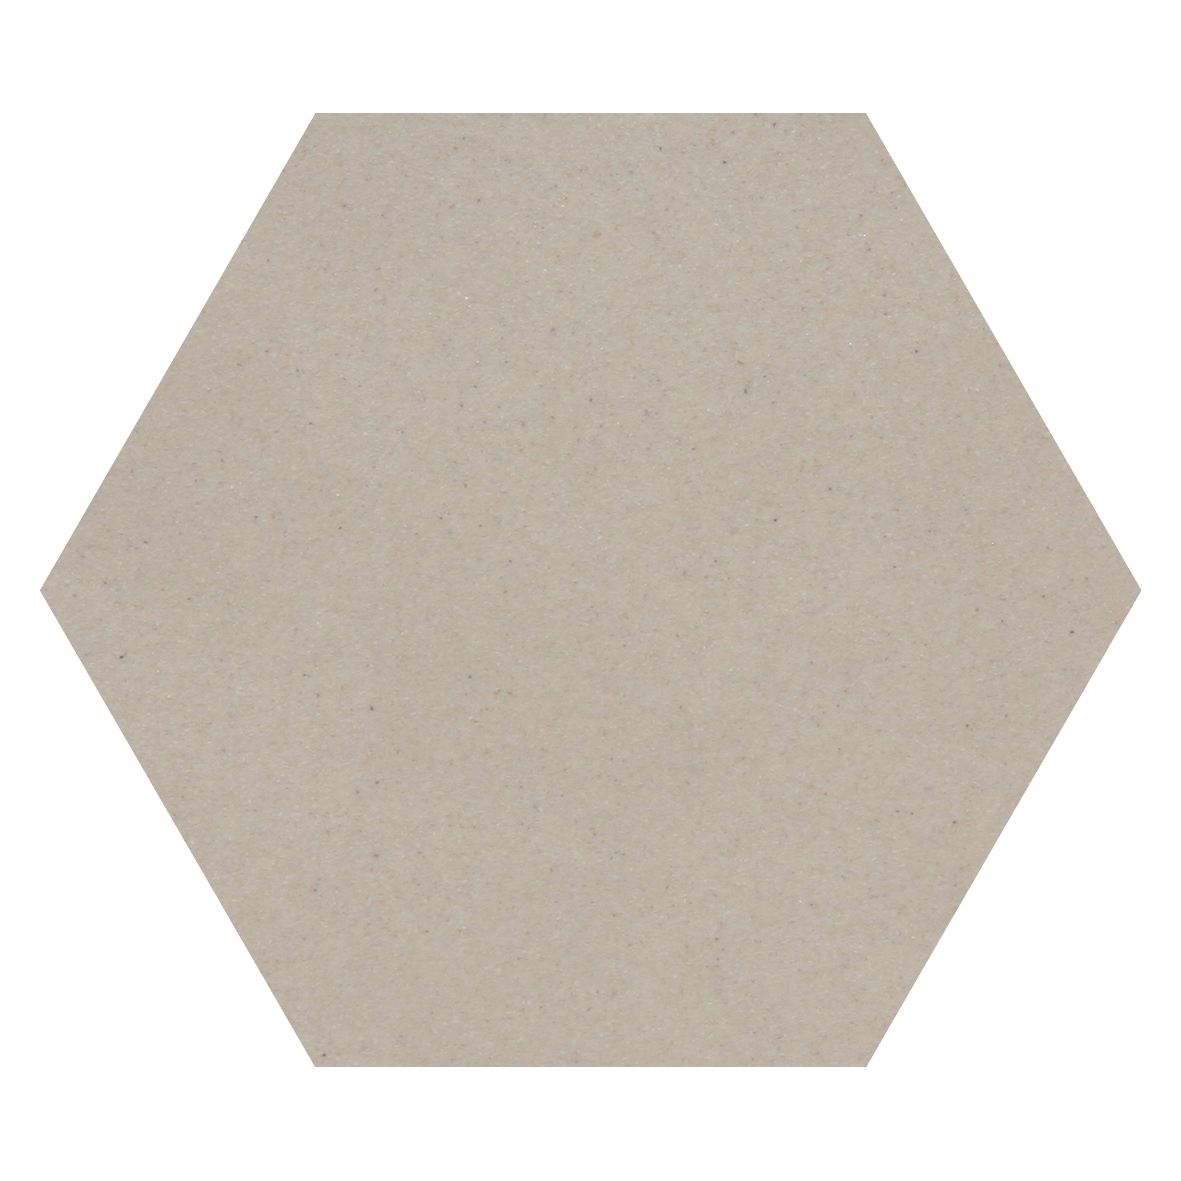 L4401HEX/1C, Natura, Beige, lattia,pakkasenkesto,uimahalli,design_from_finland